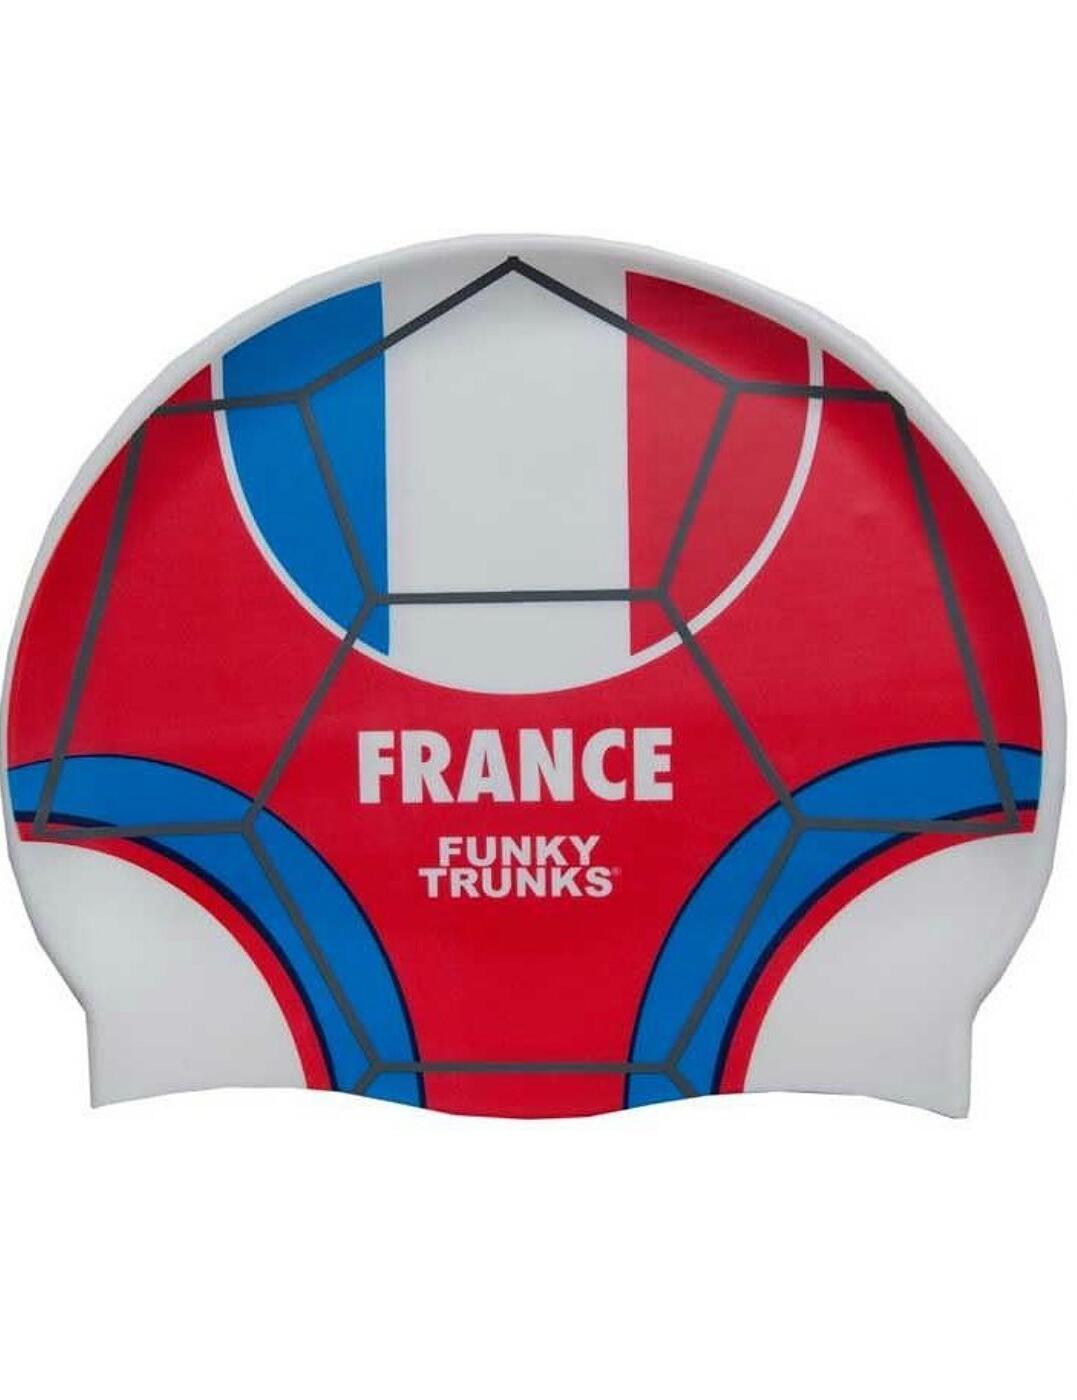 FT9900674 Funky Trunks Silicone Swimming Cap - FT9900674 Les Bleus